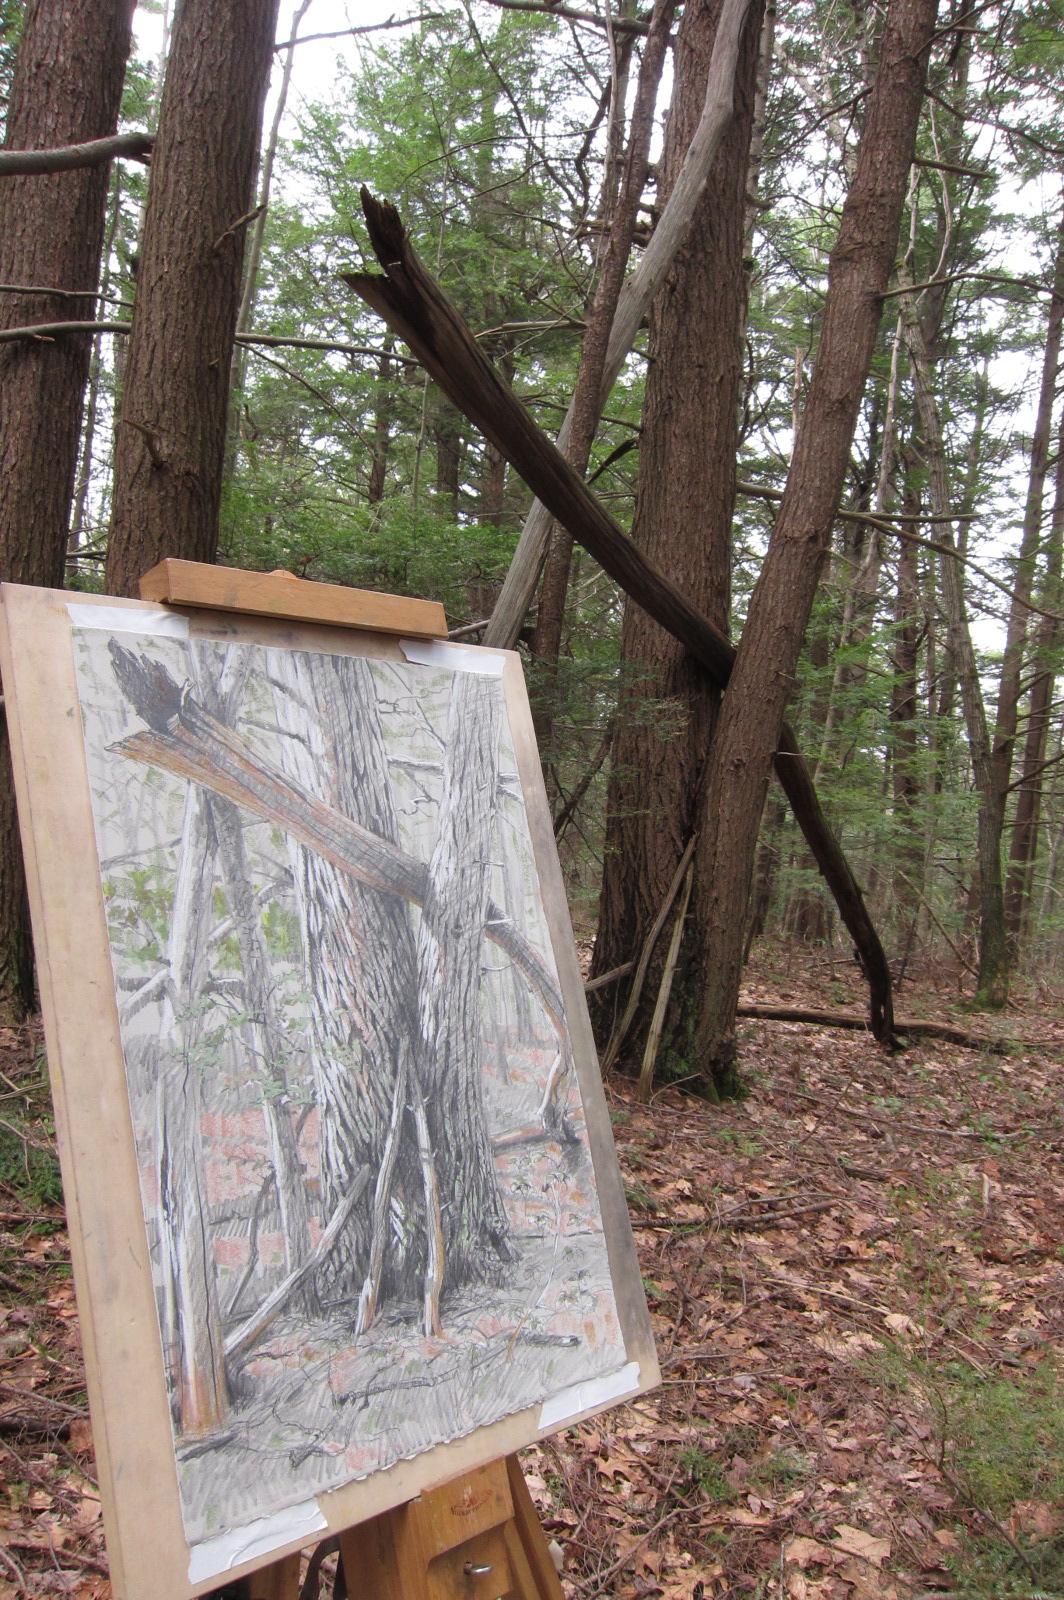 Harvard Forest: Site 1: HF Hemlock Grove With Chestnut Skeletons